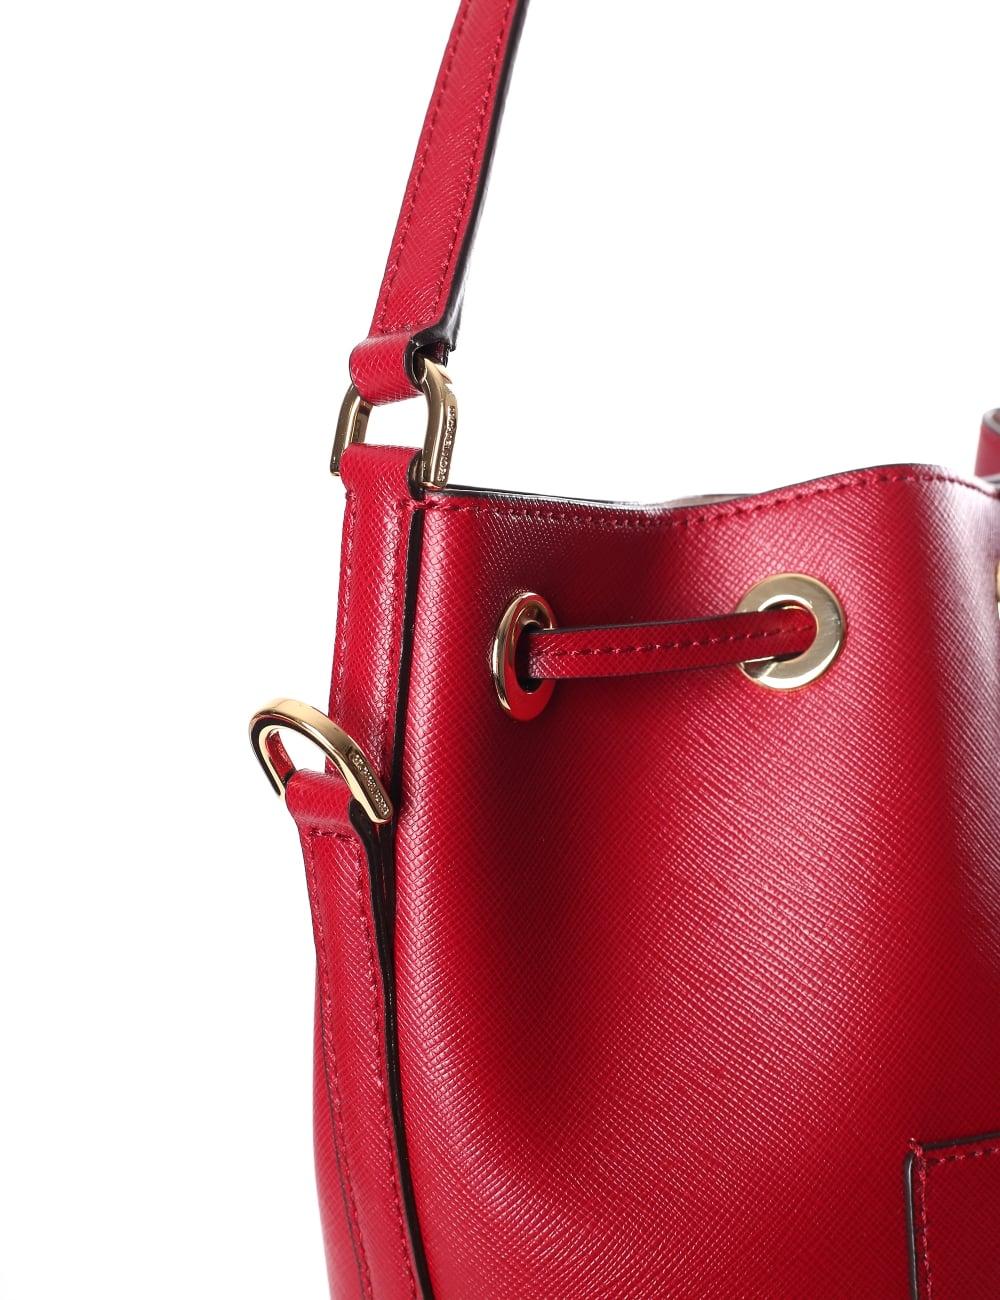 2e7b4f1cb61a Greenwich Women's Medium Bucket Bag